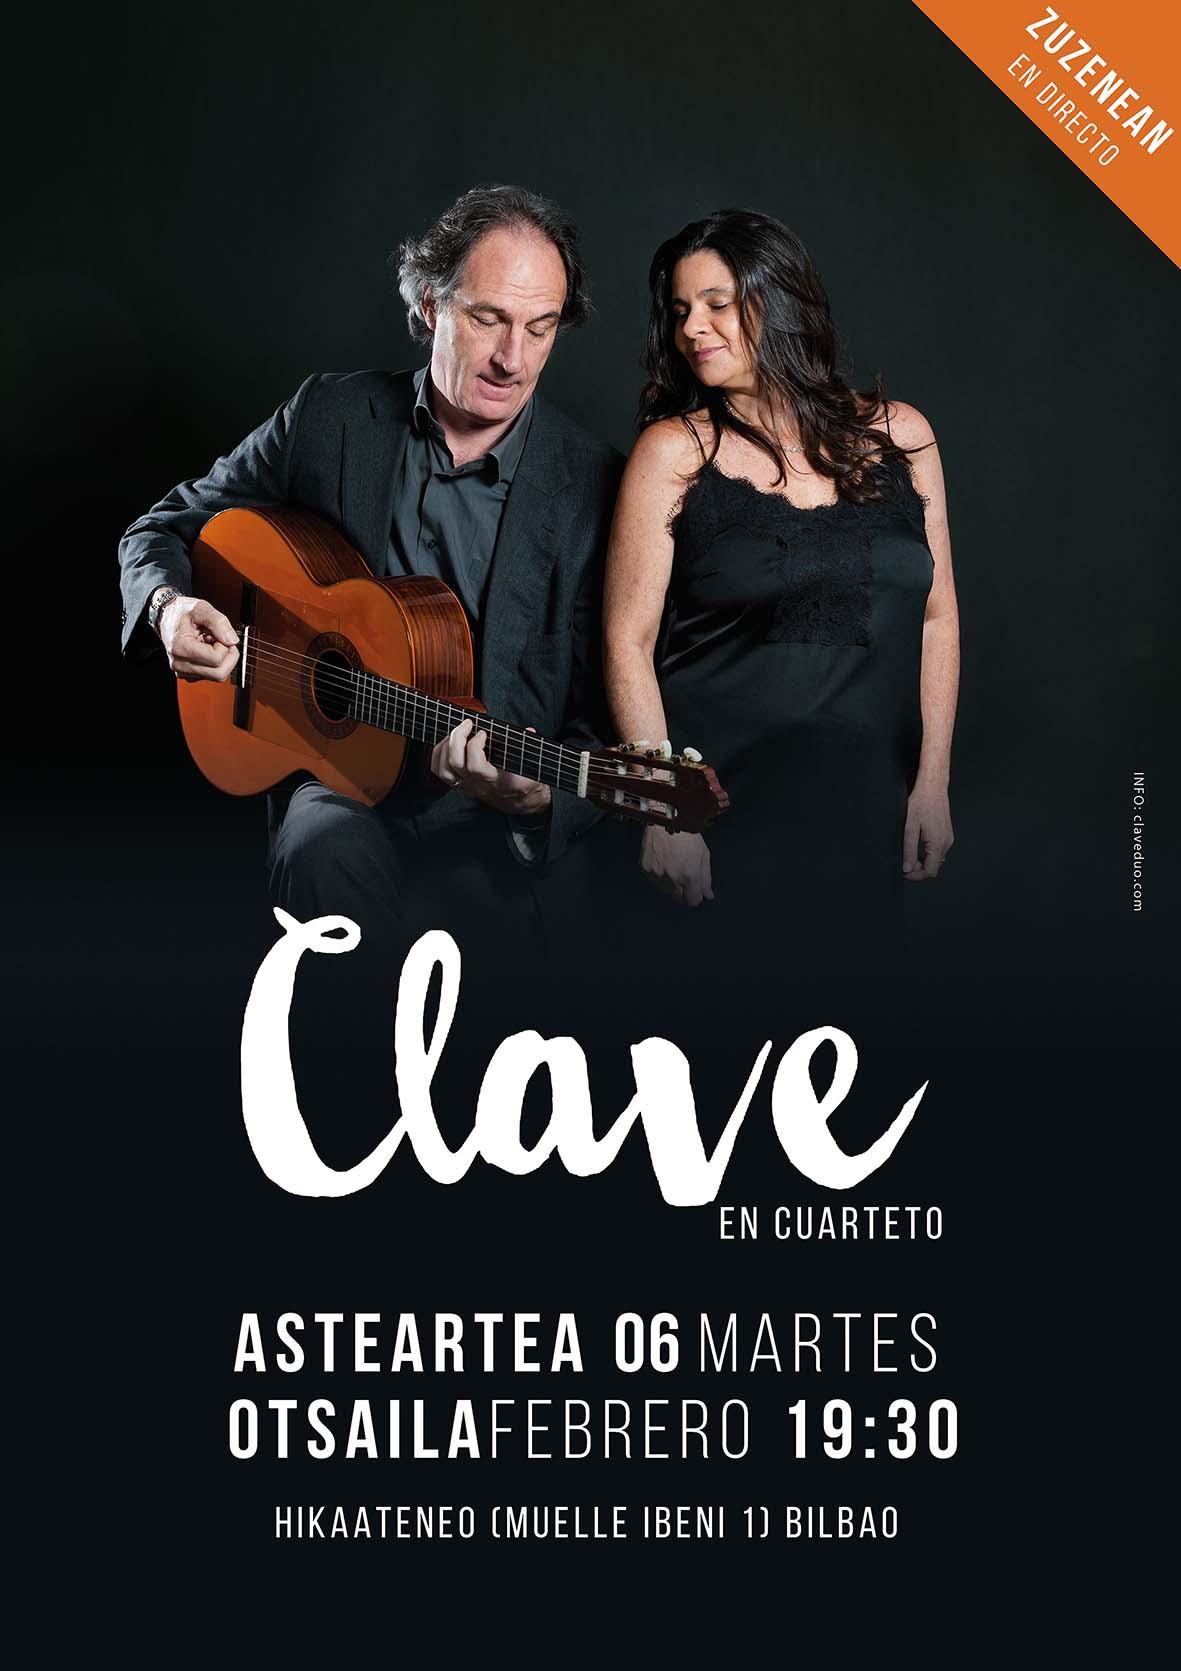 Clave Cuarteto Hika Bilbao